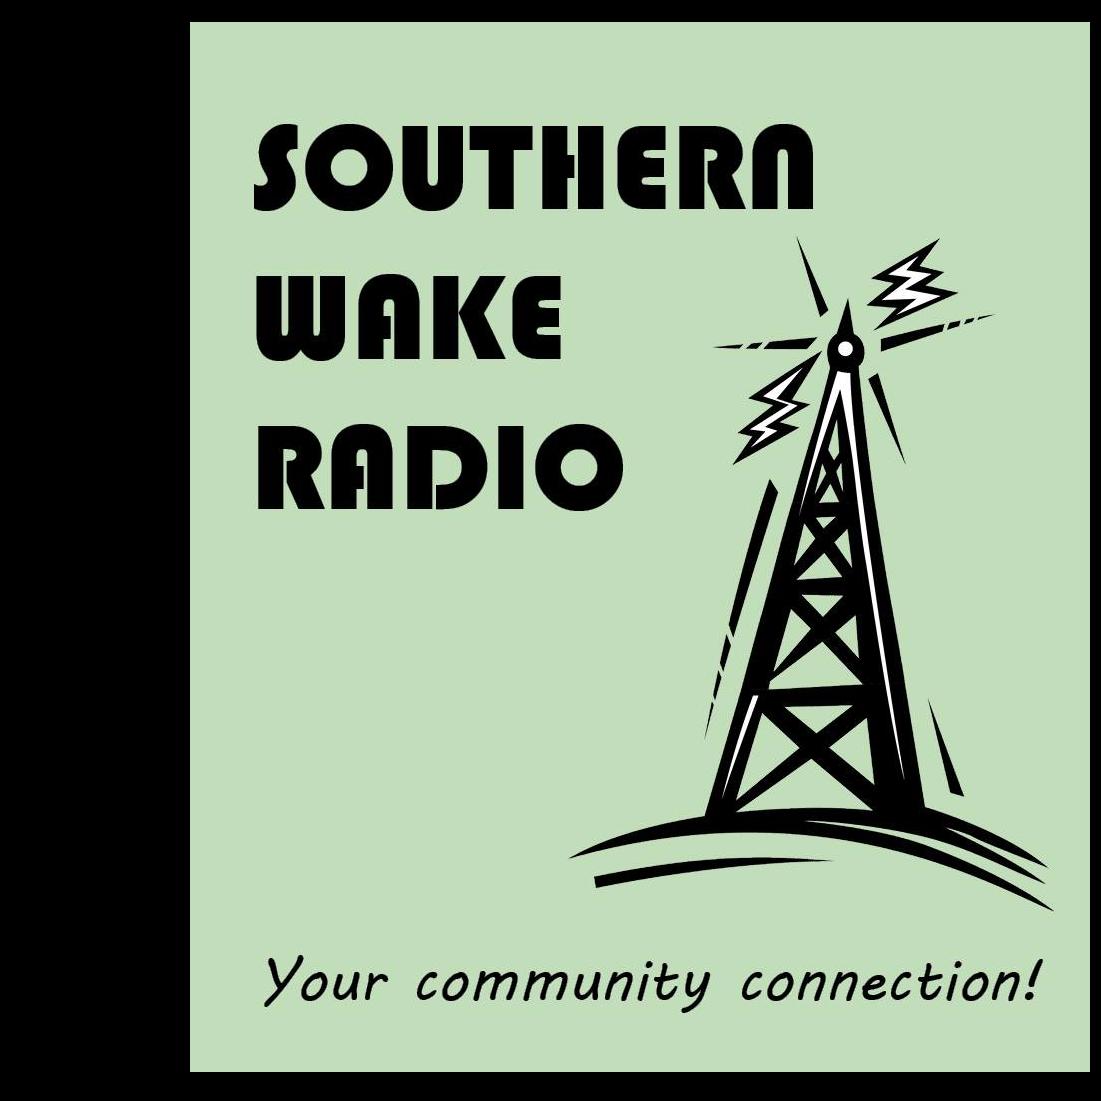 Southern Wake Radio